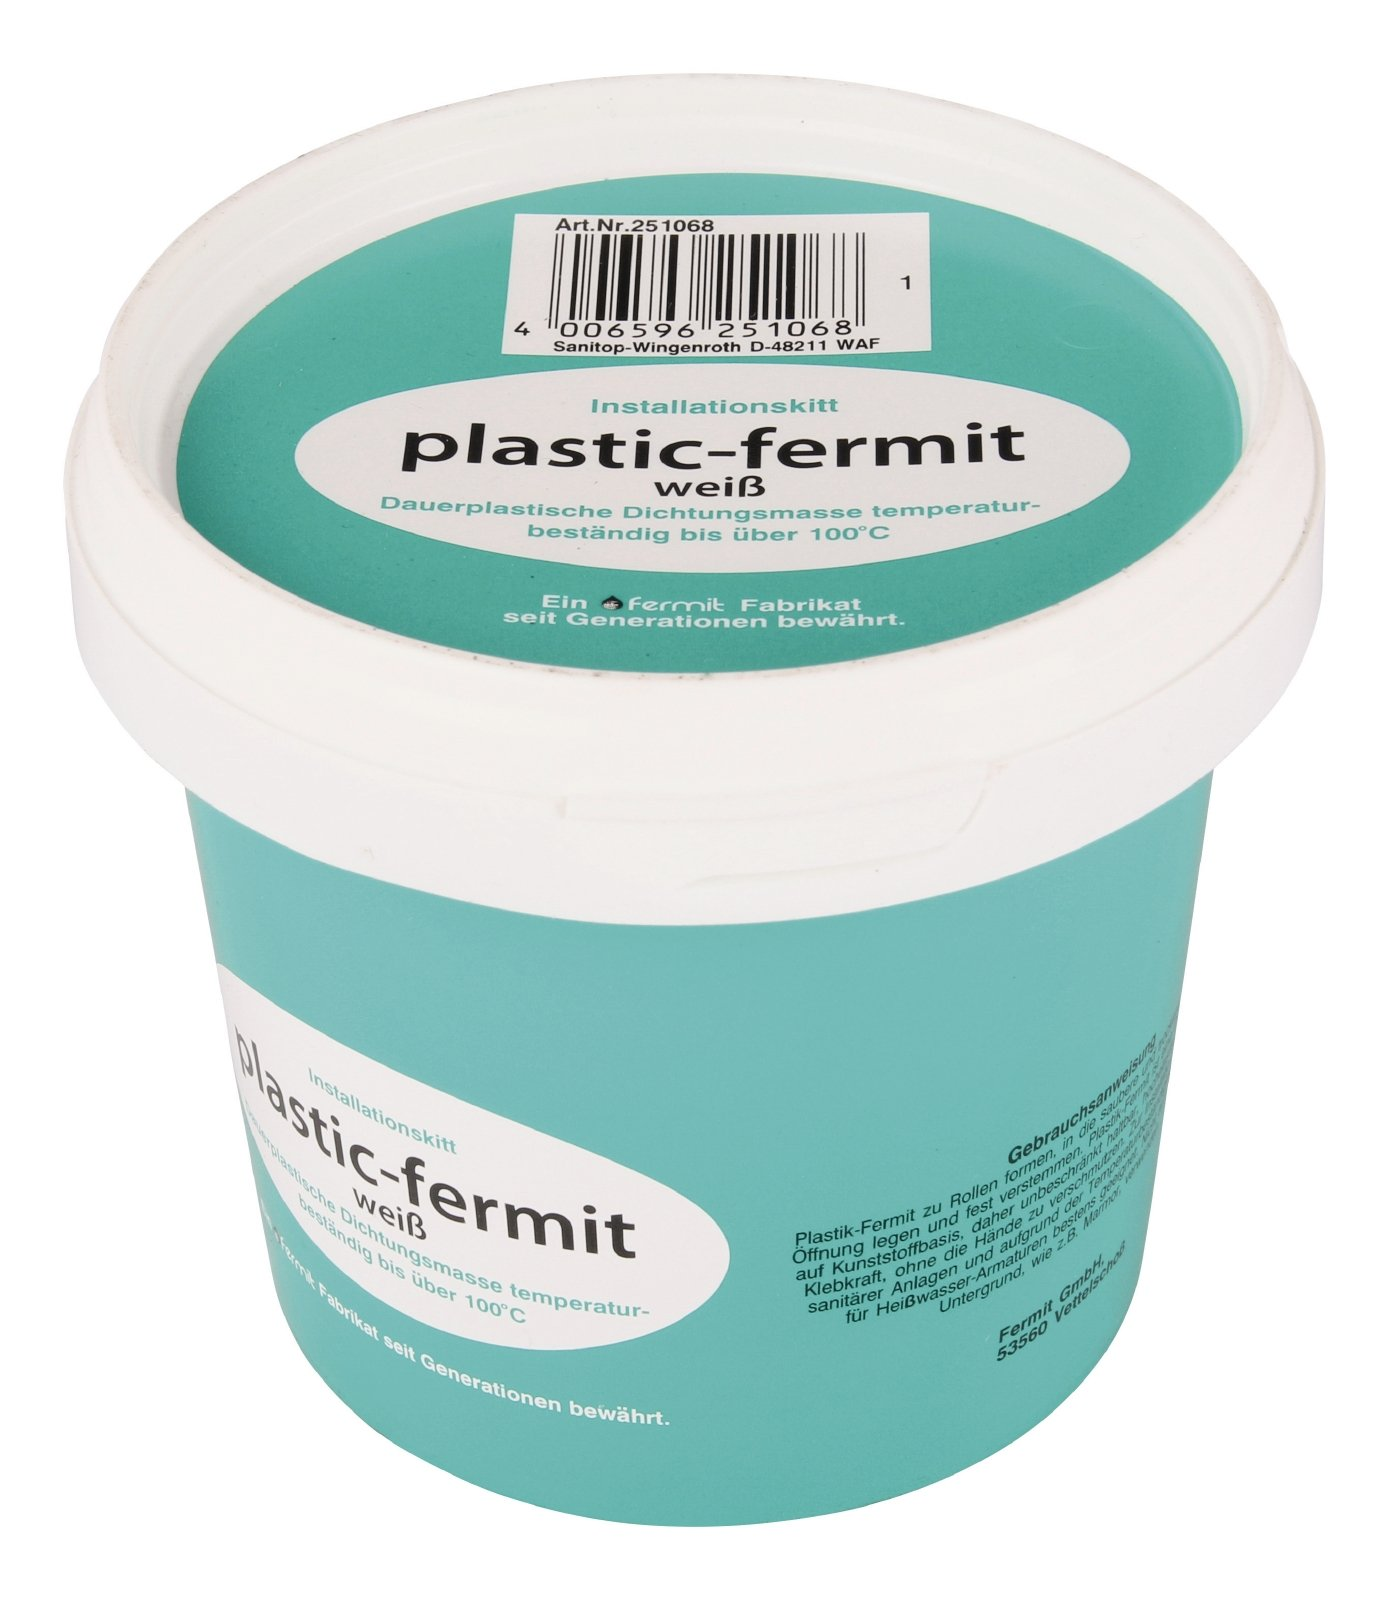 Sanitop-Wingenroth Plastic Fermit Installation Kit 500g, Qty 1, 251068